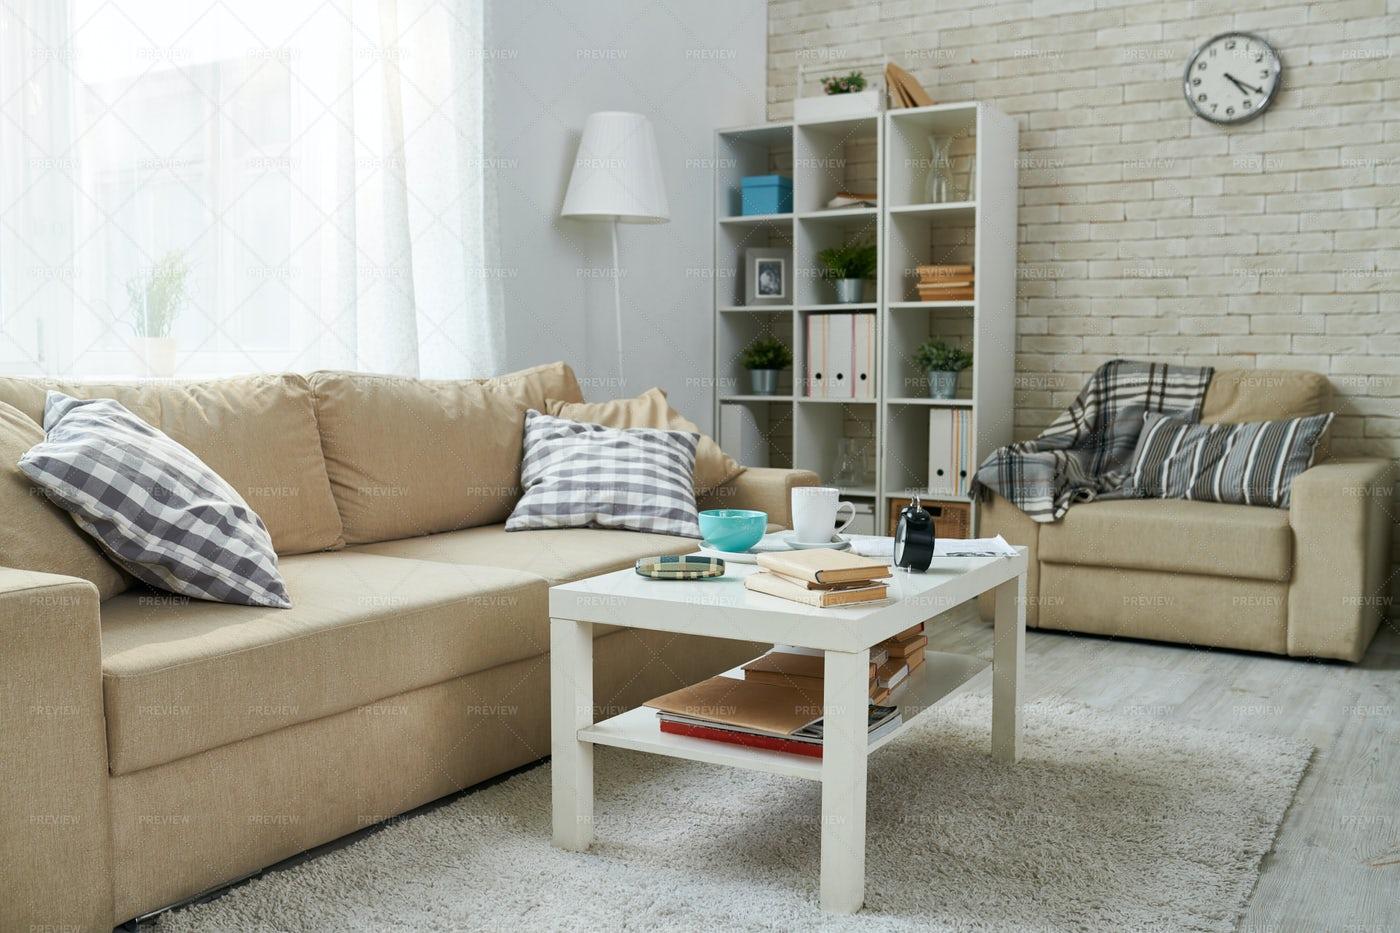 Cozy Home Room: Stock Photos